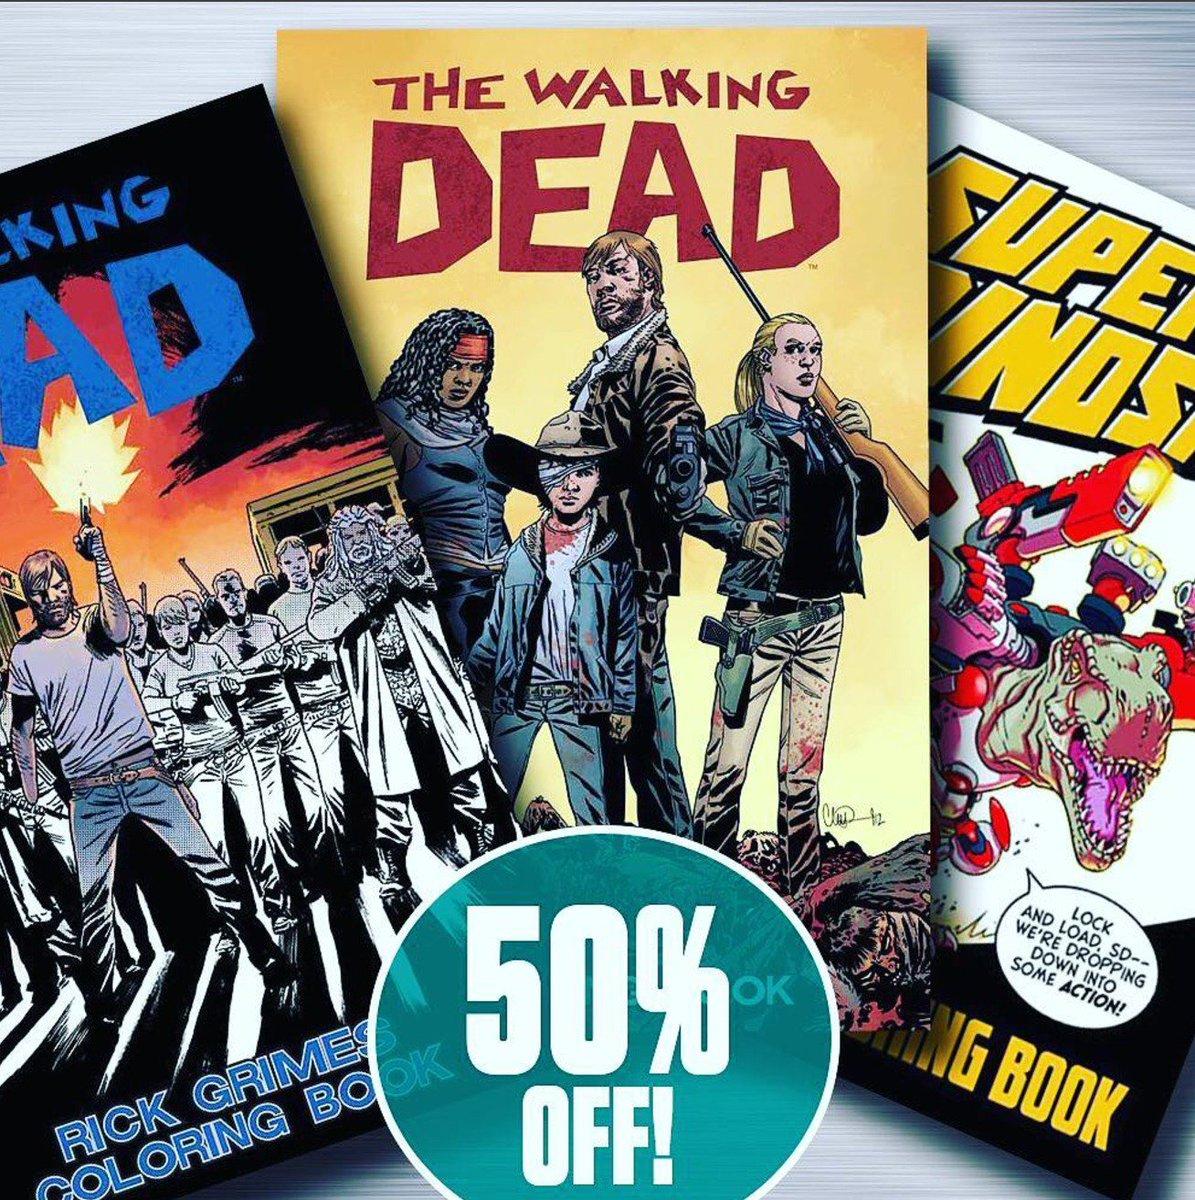 The Walking Dead On Twitter Grab Our Exclusive Walkingdead